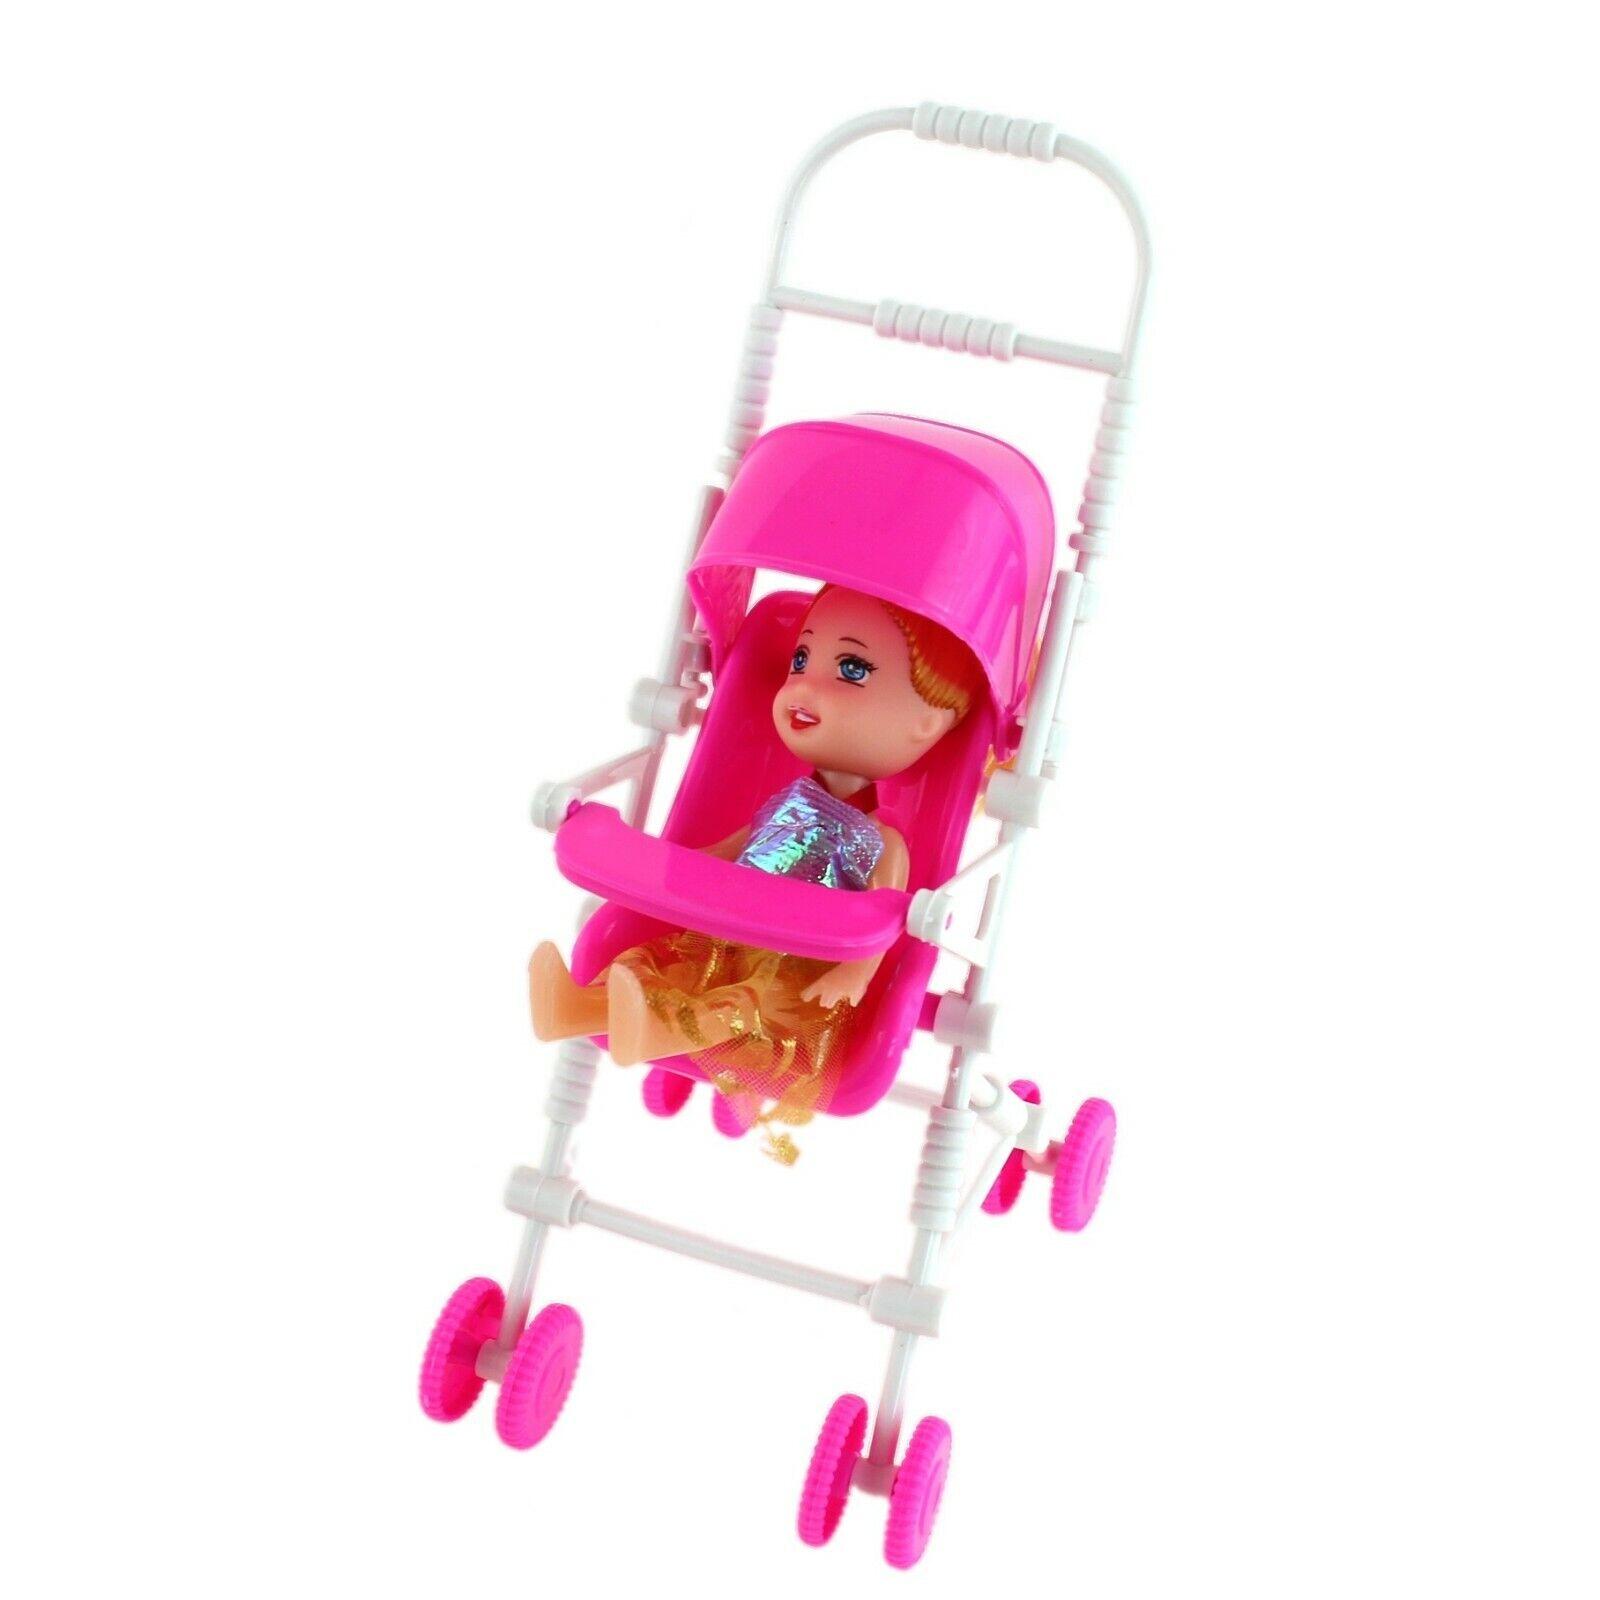 Pink Dolls Pushchair Stroller Toy Doll Pram Buggy Baby Gift